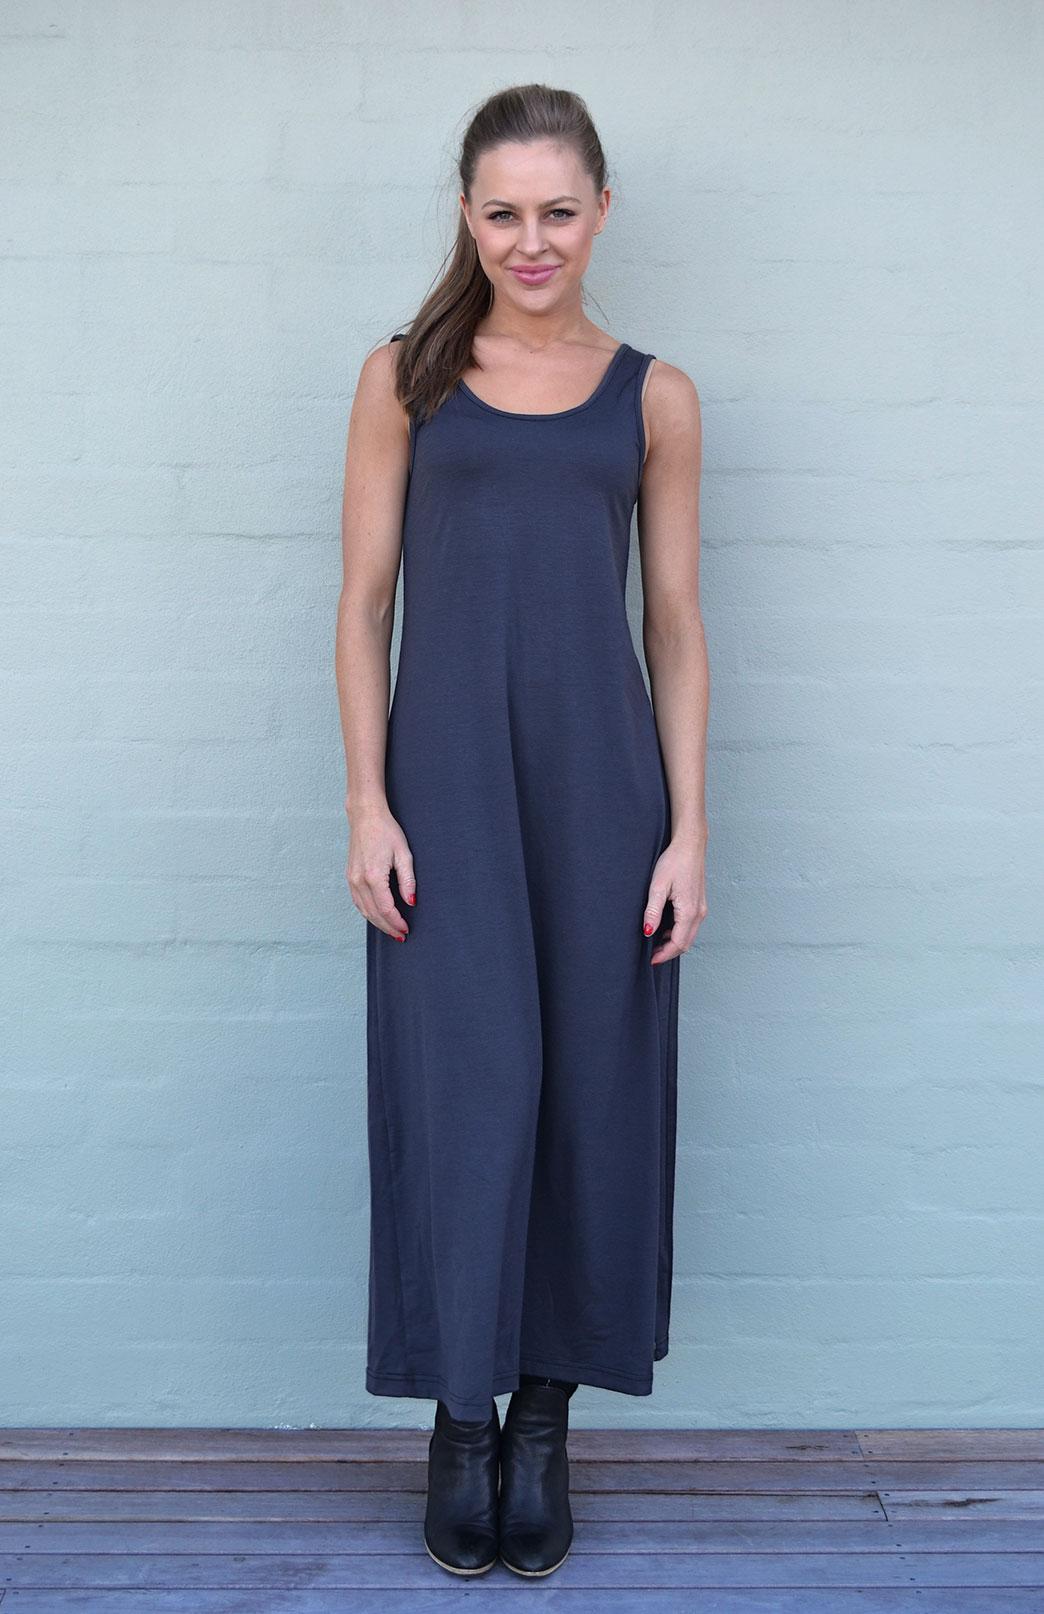 Maxi Dress - Plain - Women's Merino Wool Steel Grey Maxi Dress with Scoop Neckline - Smitten Merino Tasmania Australia